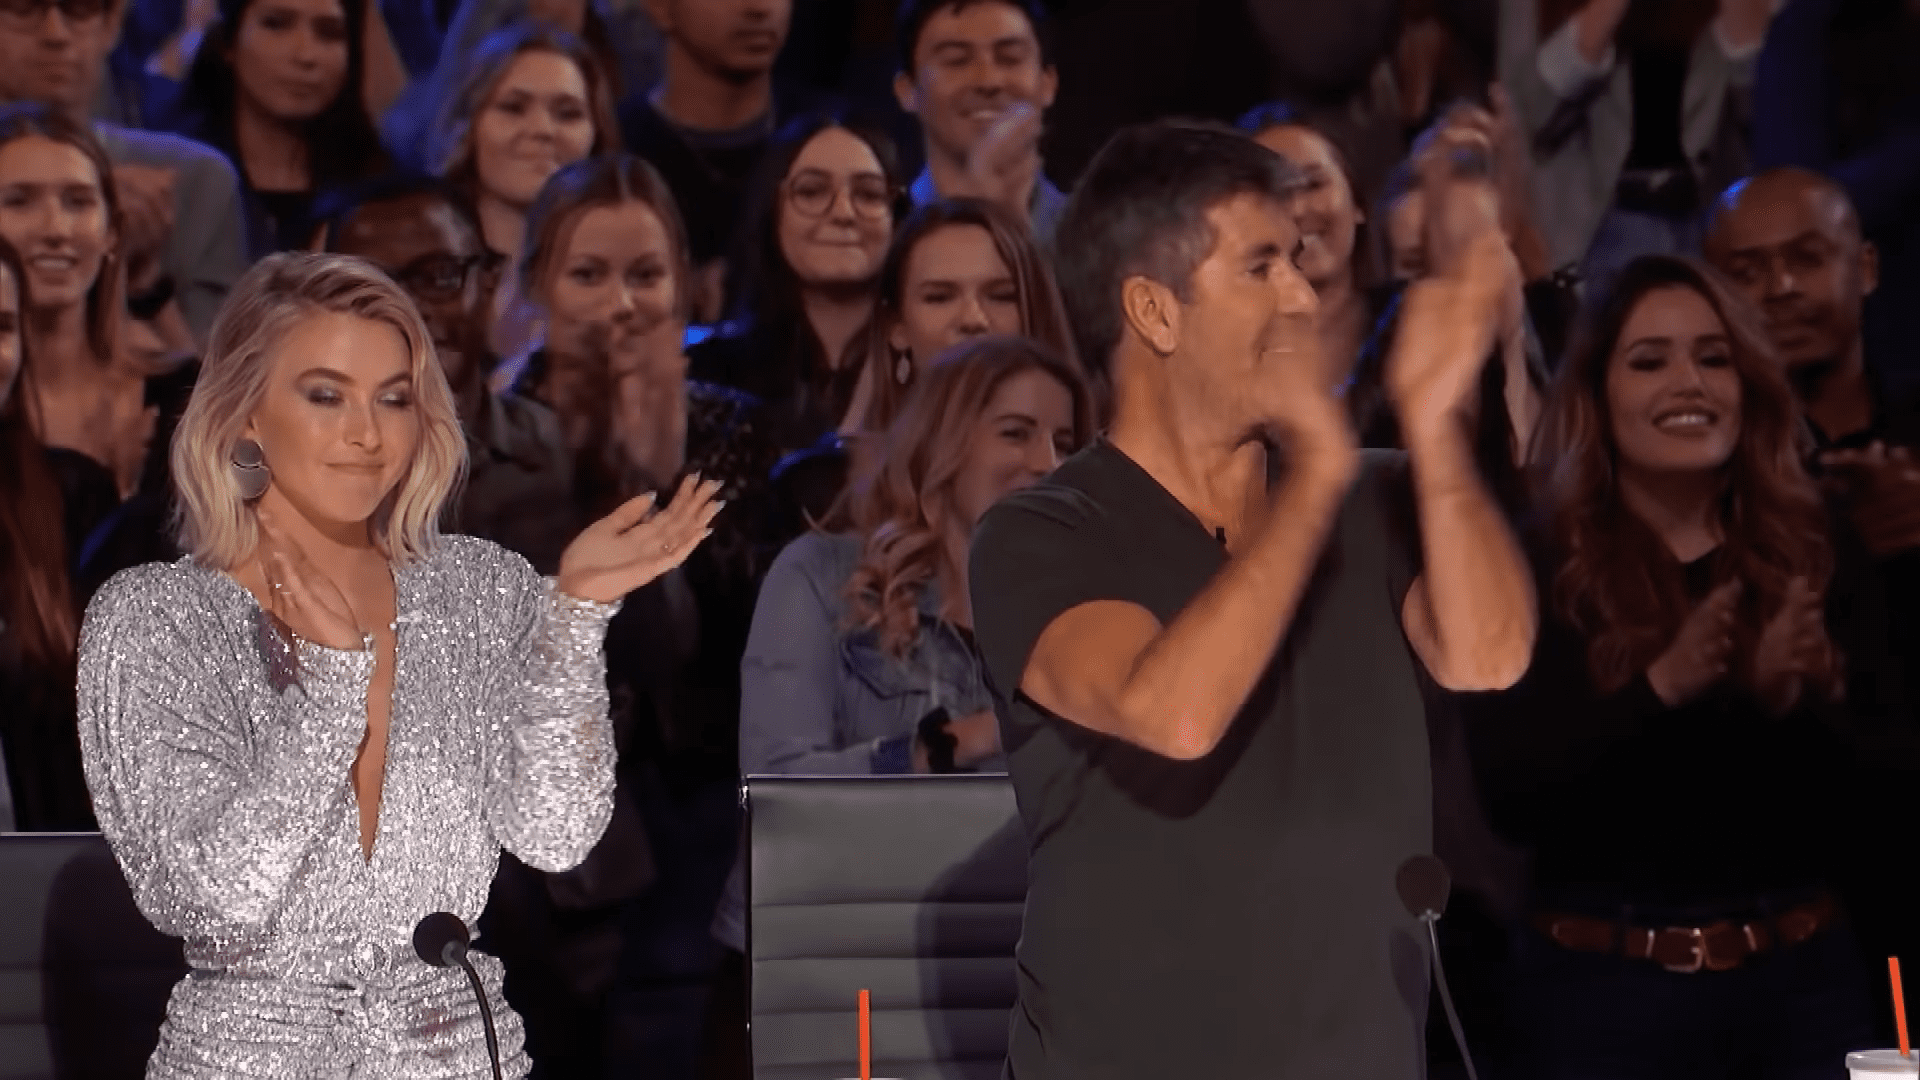 El jurado aplaudiendo de pie a Kodi │Imagen tomada de: YouTube / America's Got Talent